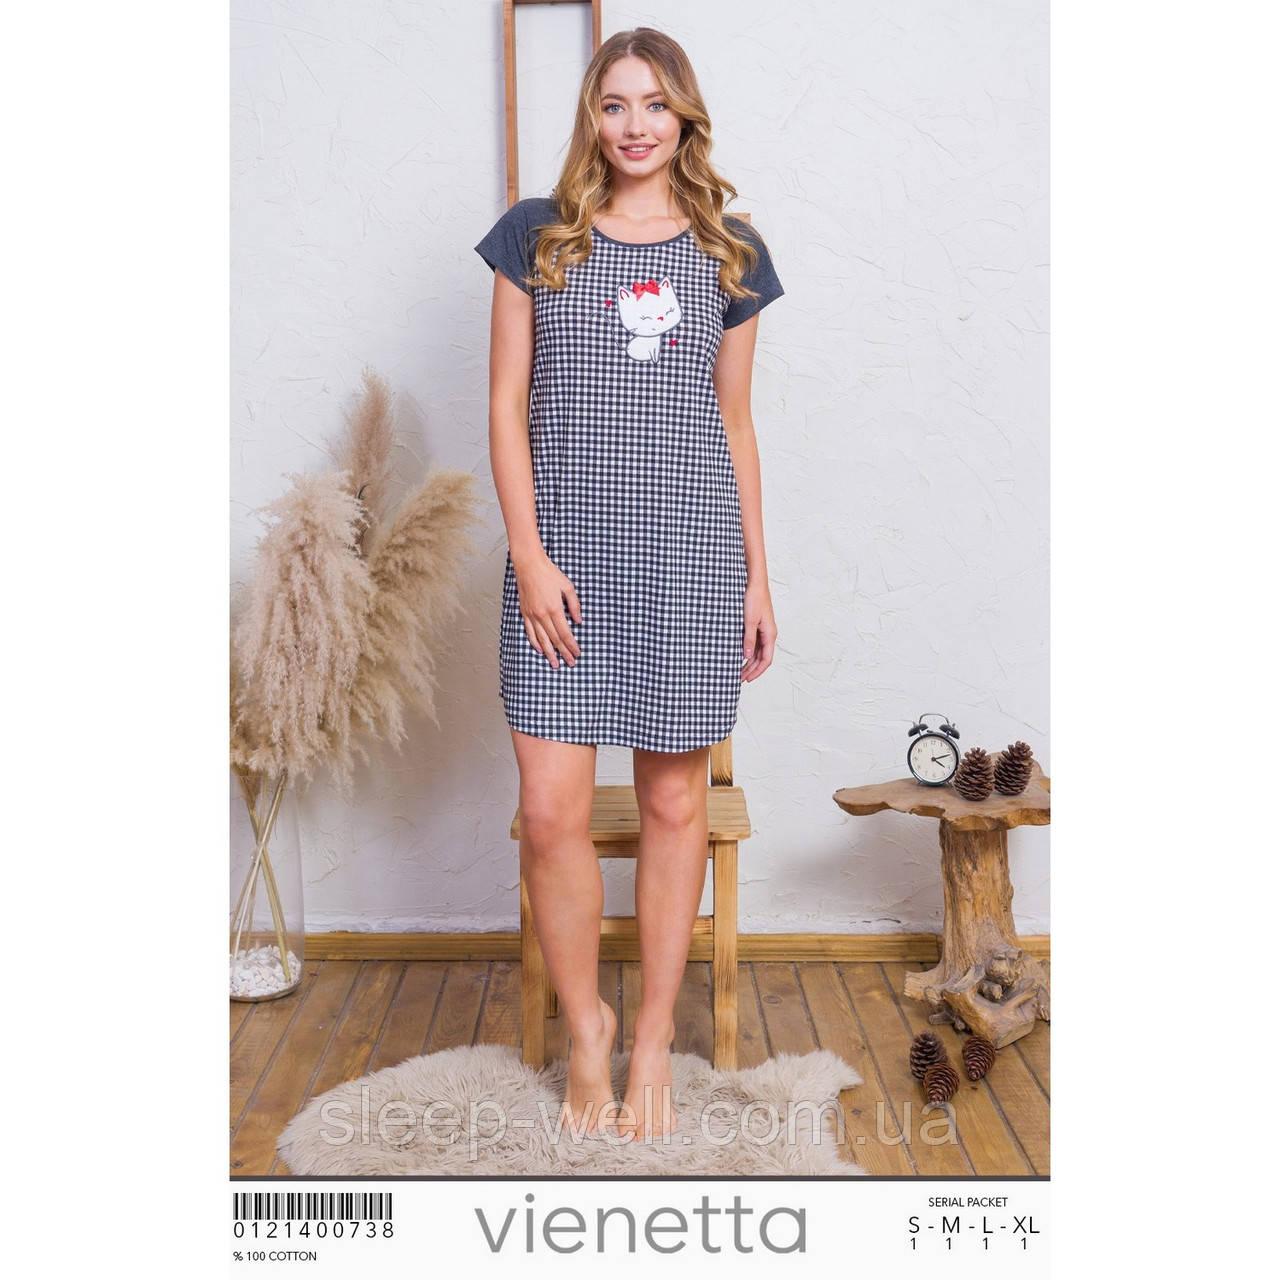 Ночная рубашка хлопок,Vinetta